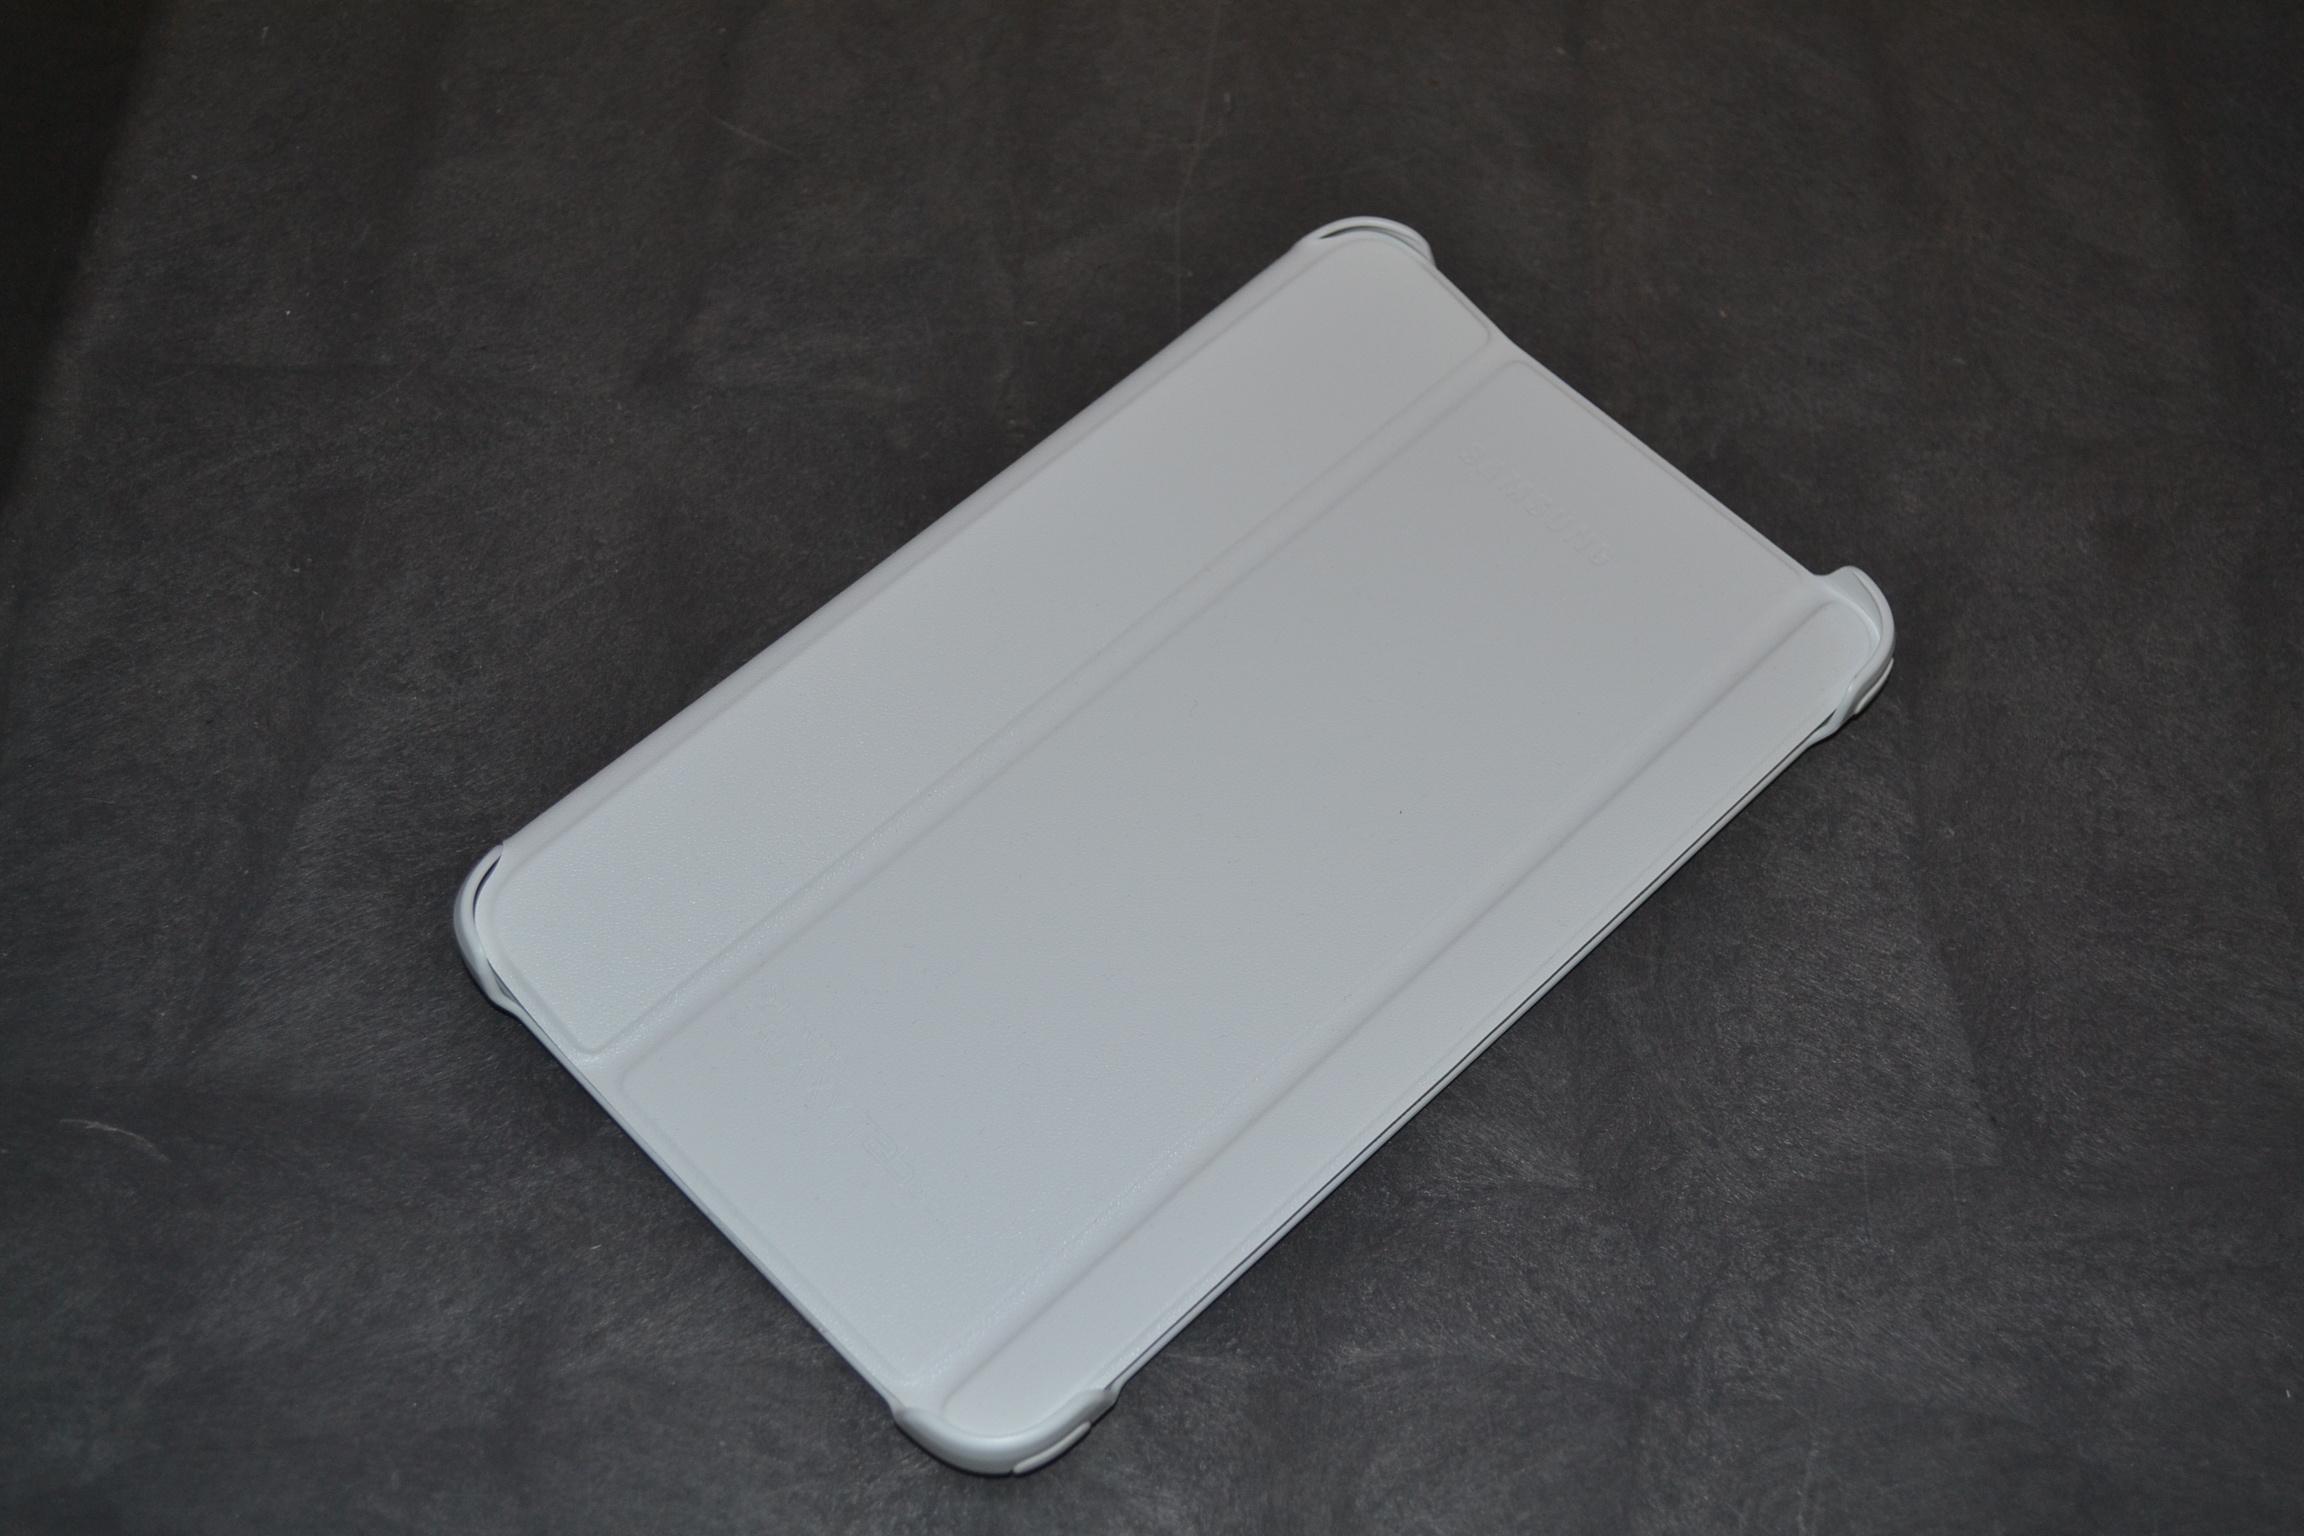 Samsung Galaxy Tab 3 Lite Book Cover EF-BT110WWEGUJ White Folding